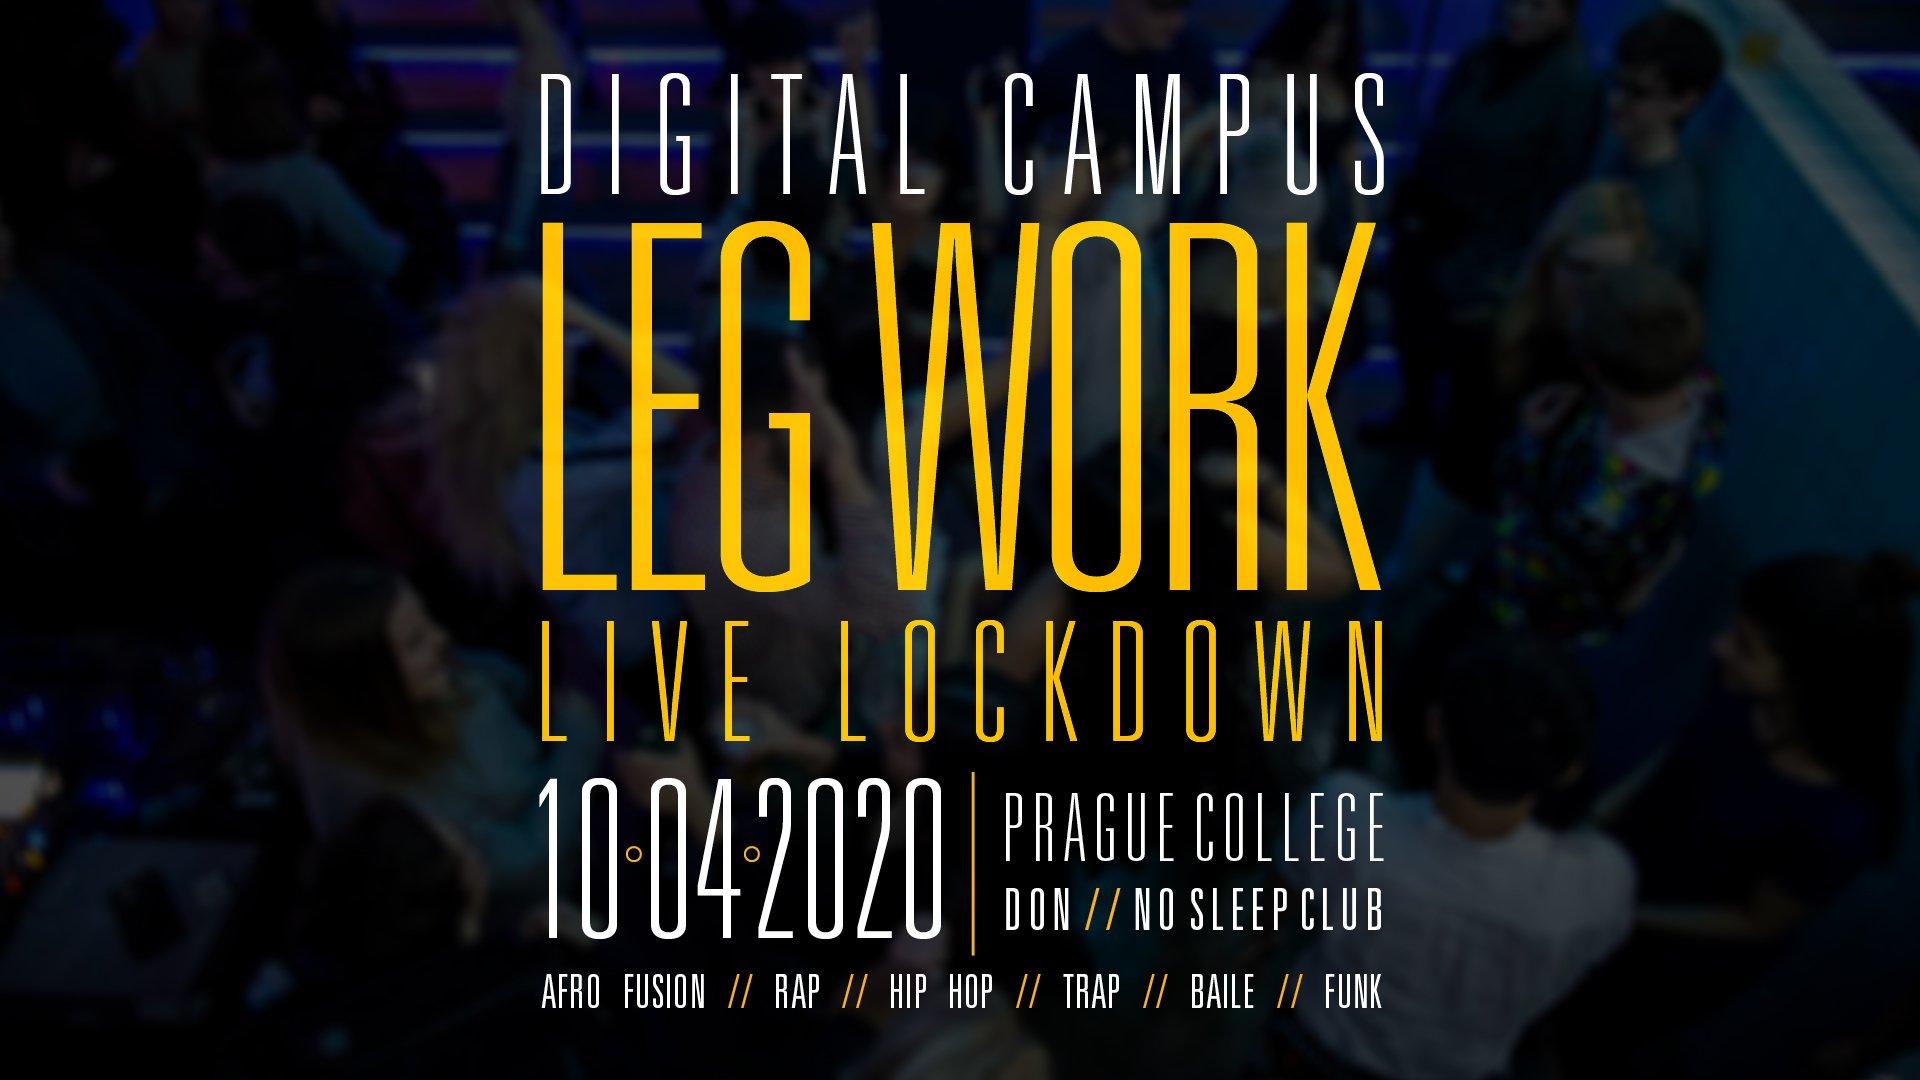 PC Legwork LIVE DJ Party